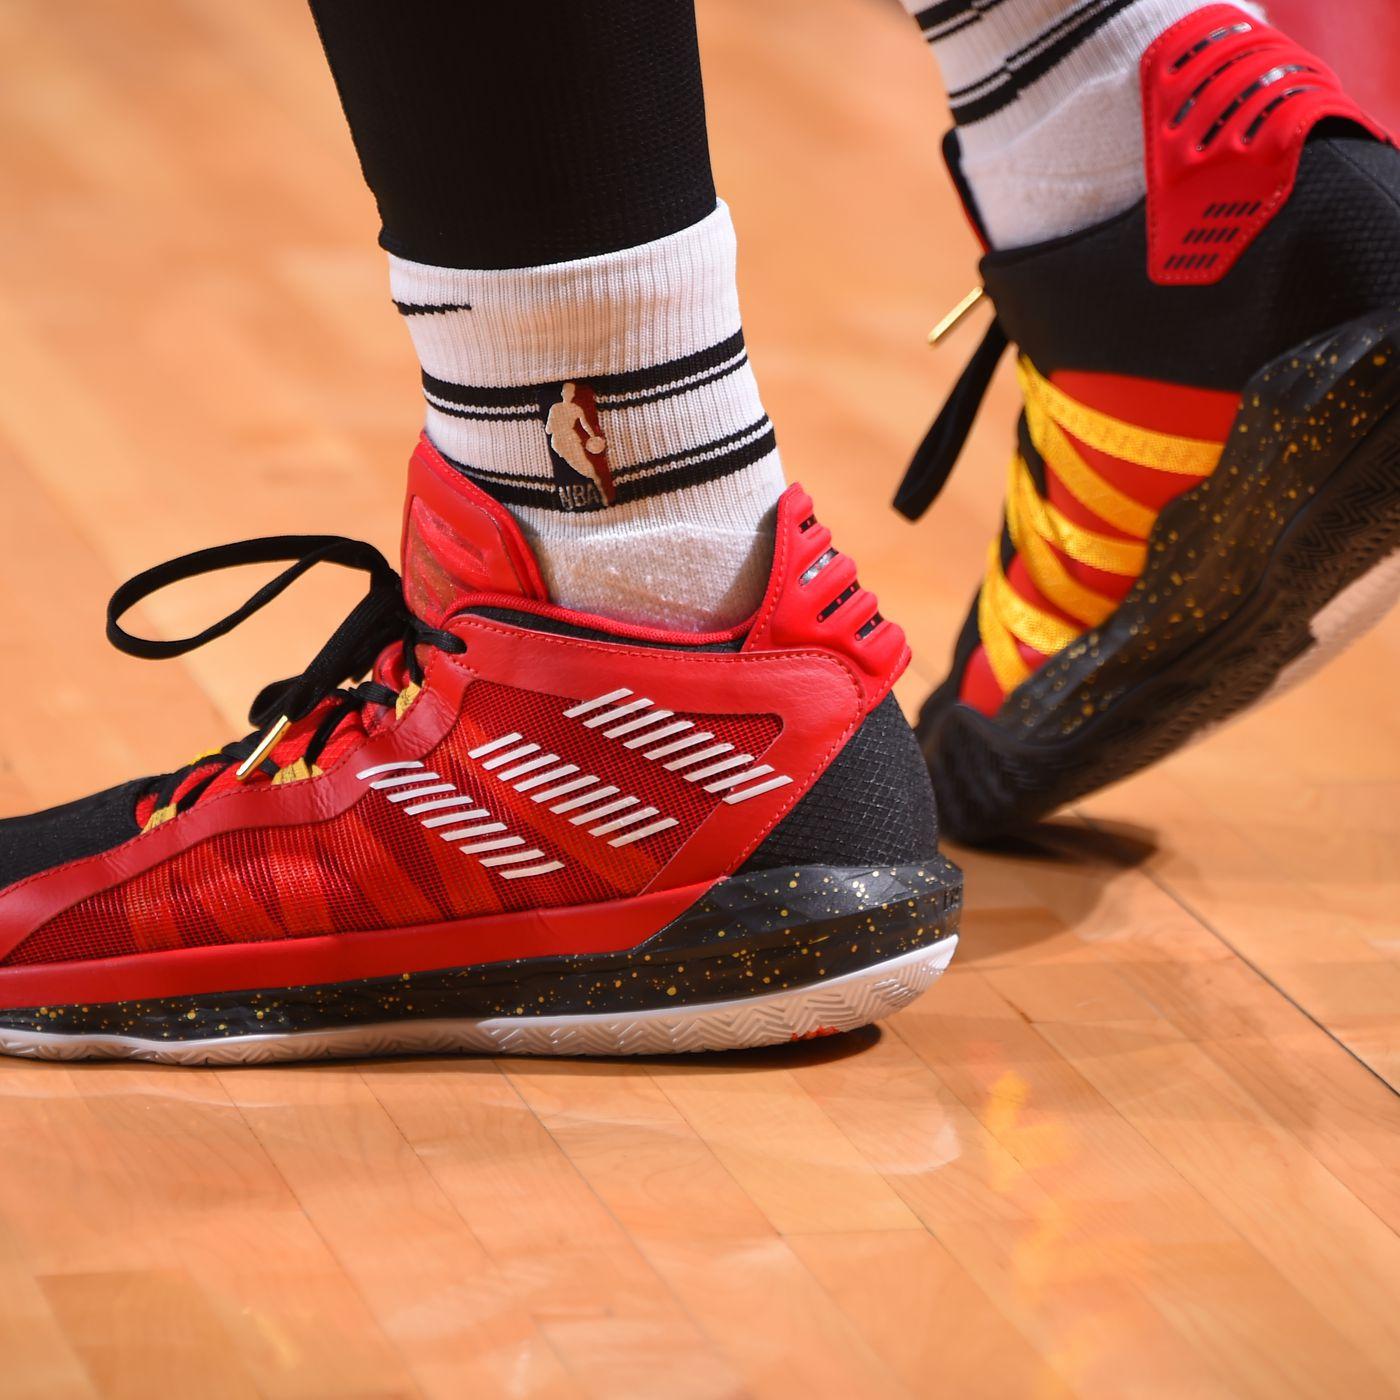 Heckler Spurs Damian Lillard's Relationship with Adidas